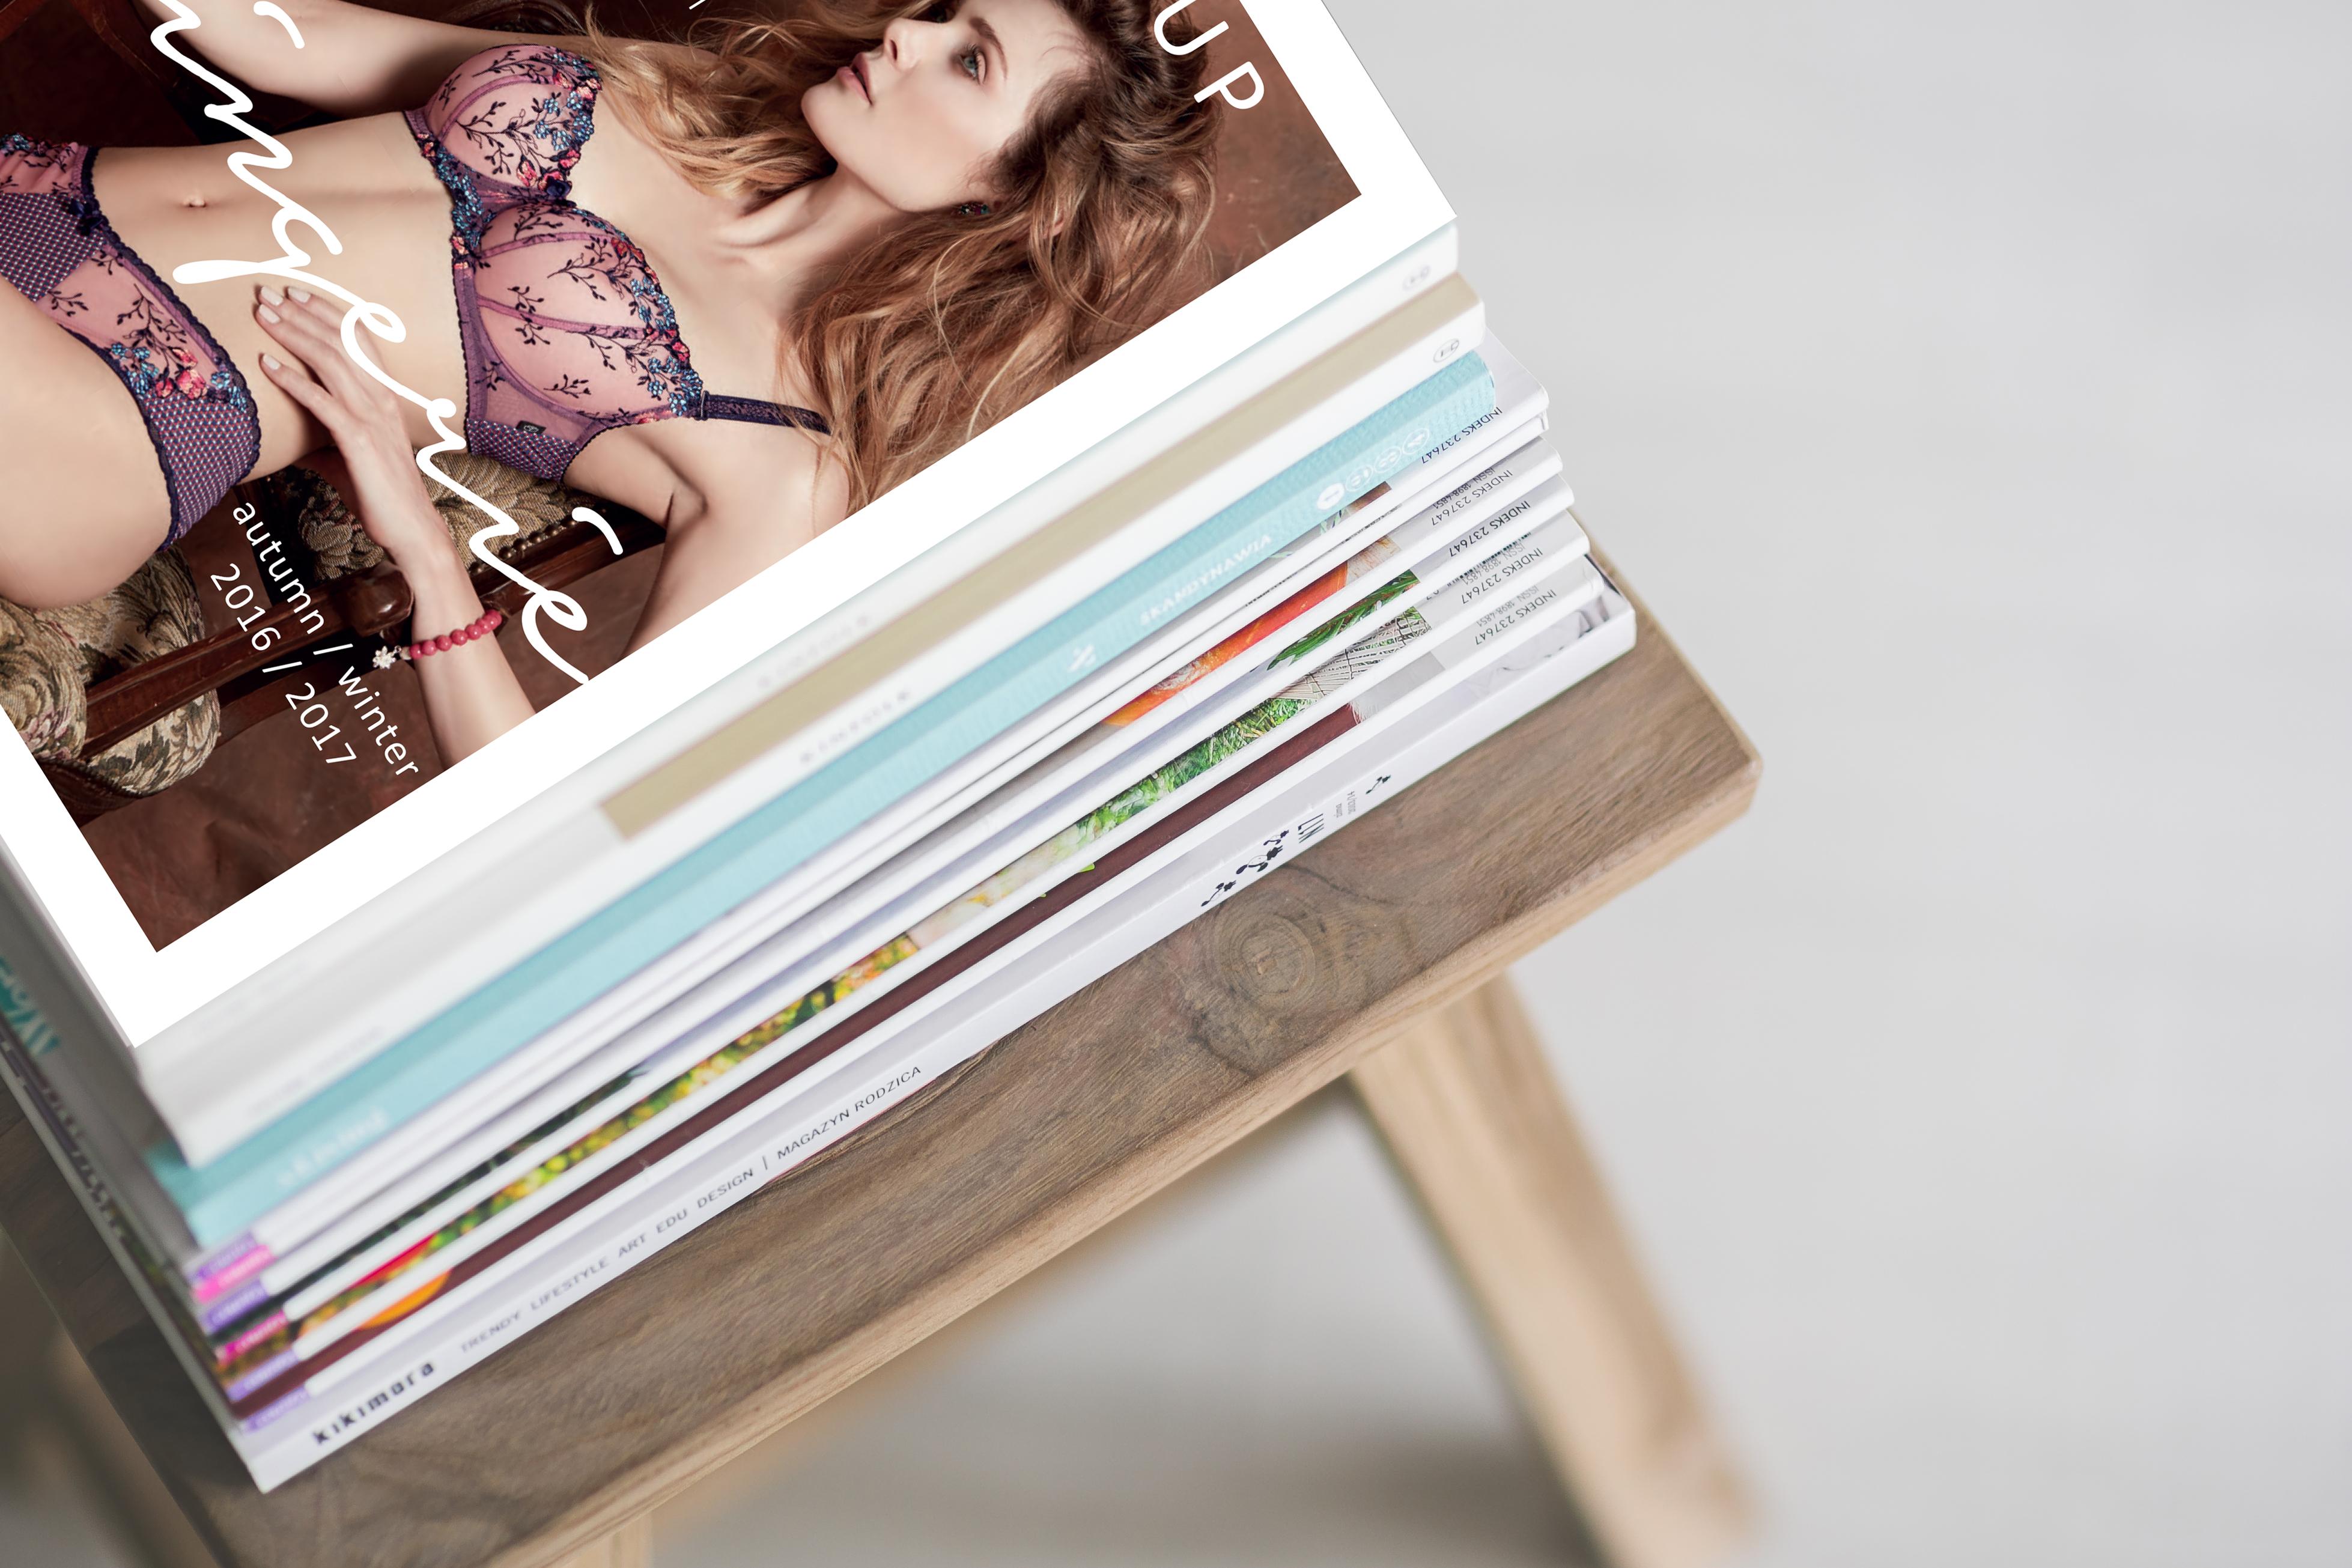 kaboompics-com_stack-of-magazines